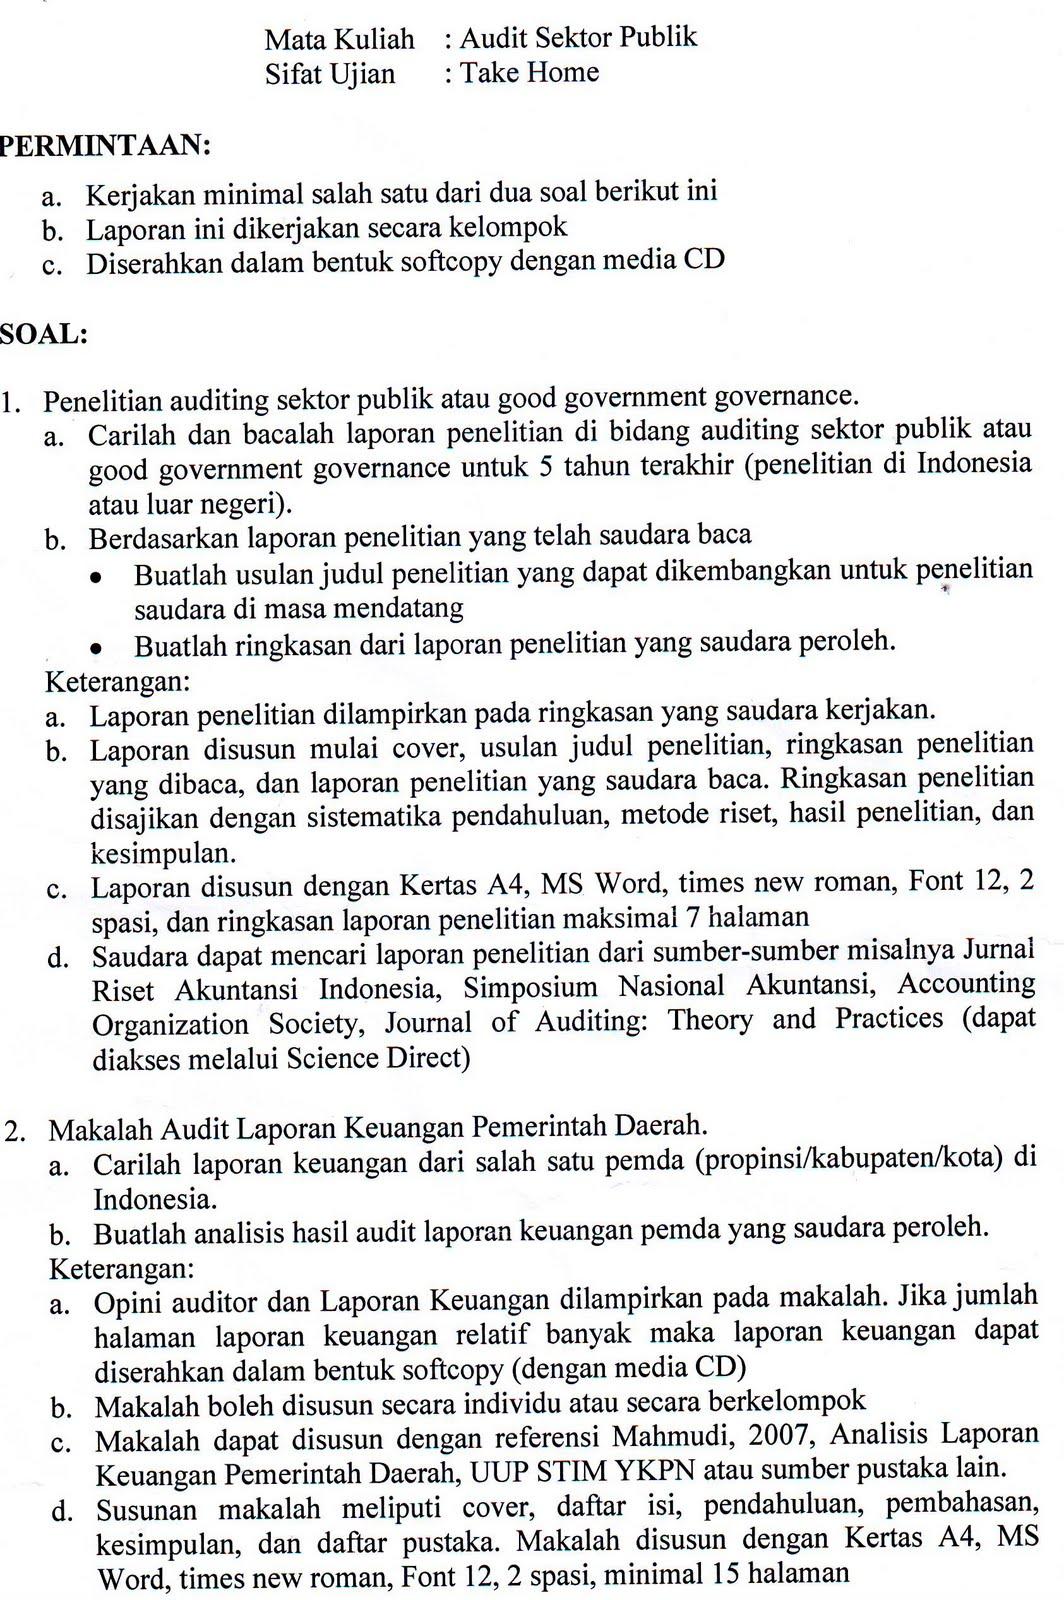 Soal Dan Jawaban Uts Audit Sektor Publik Jurusan Akuntansi Universitas Brawijaya Malang